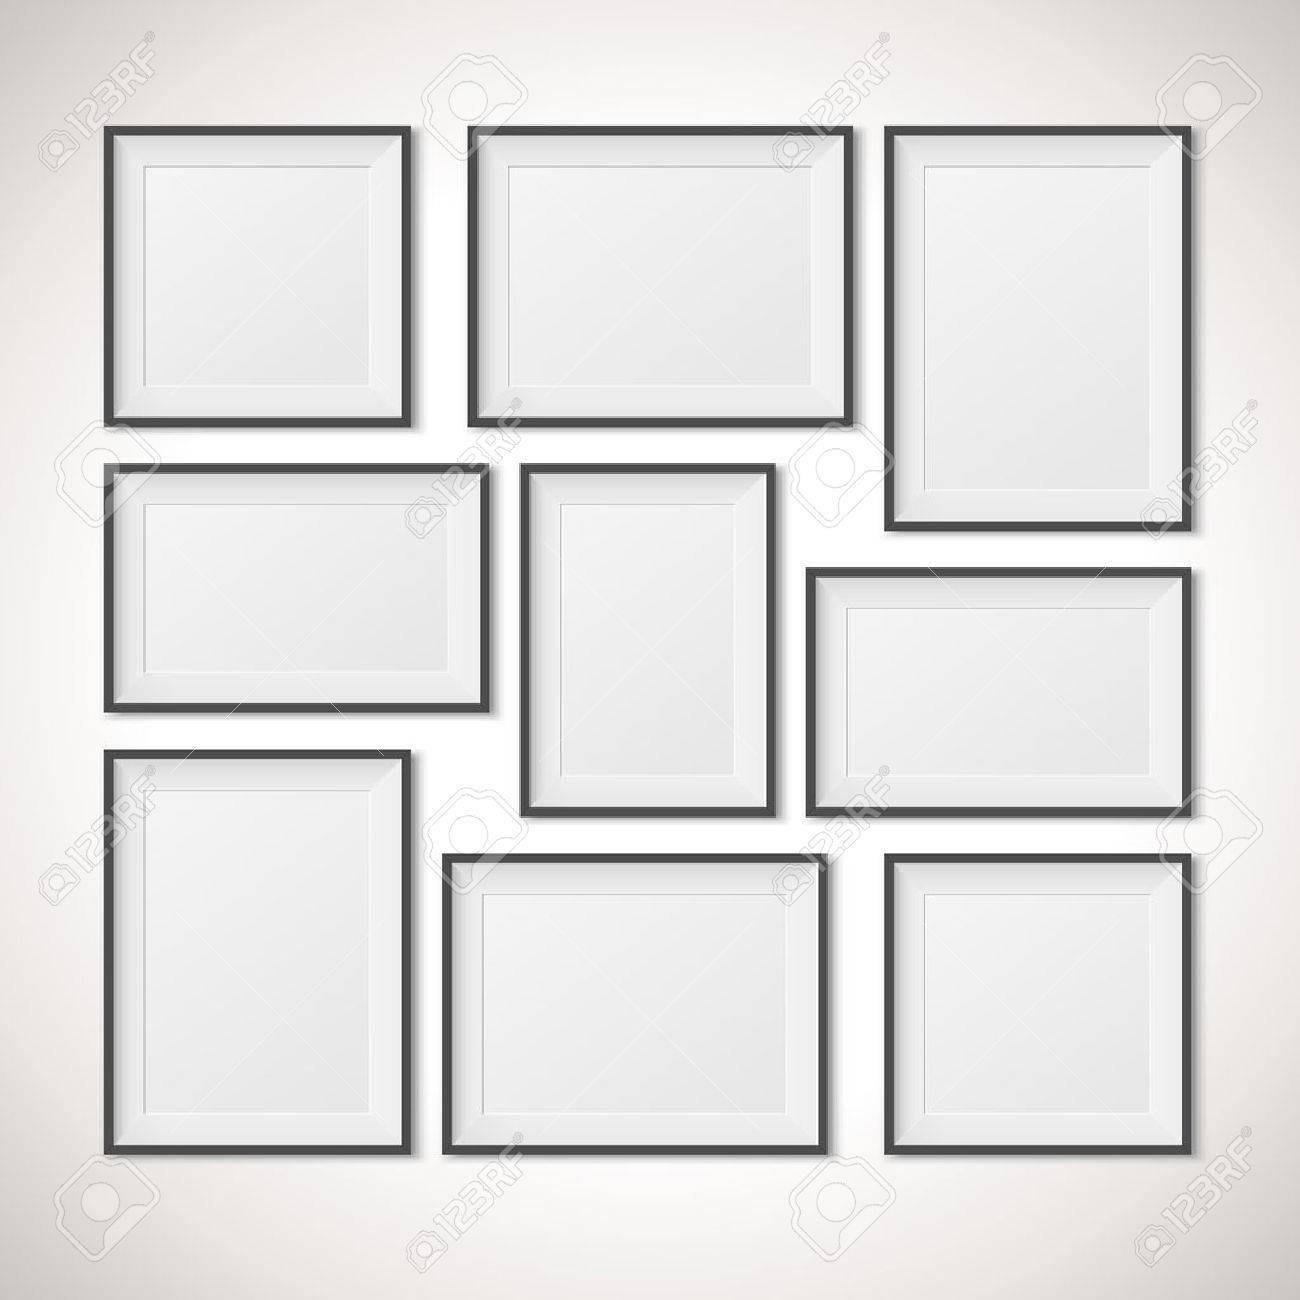 Multiple Frames Vector Illustration Royalty Free Cliparts, Vectors ...